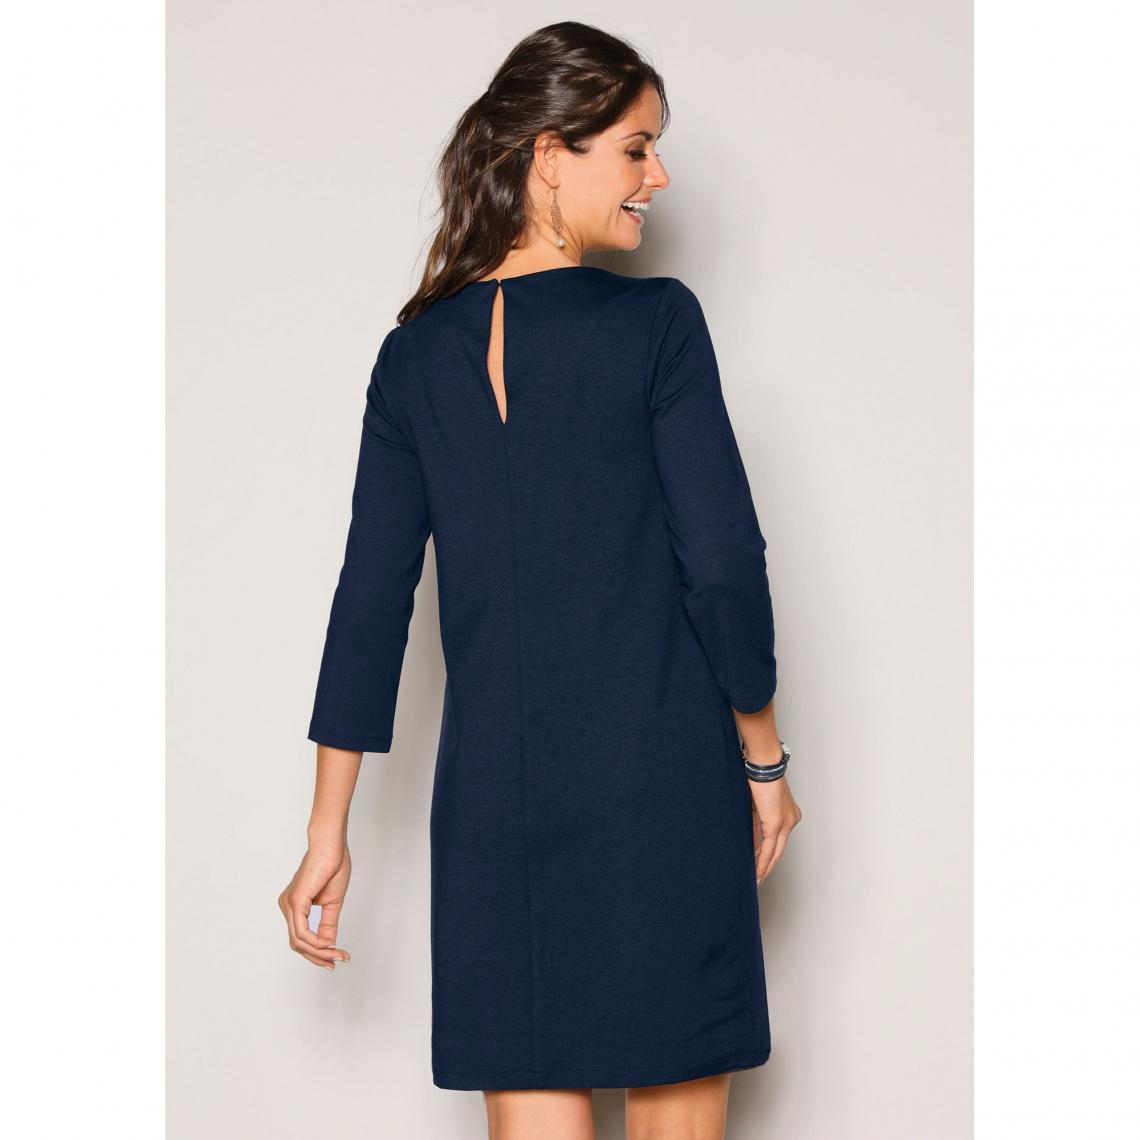 Robe Bleu Marine Femme Factory Store